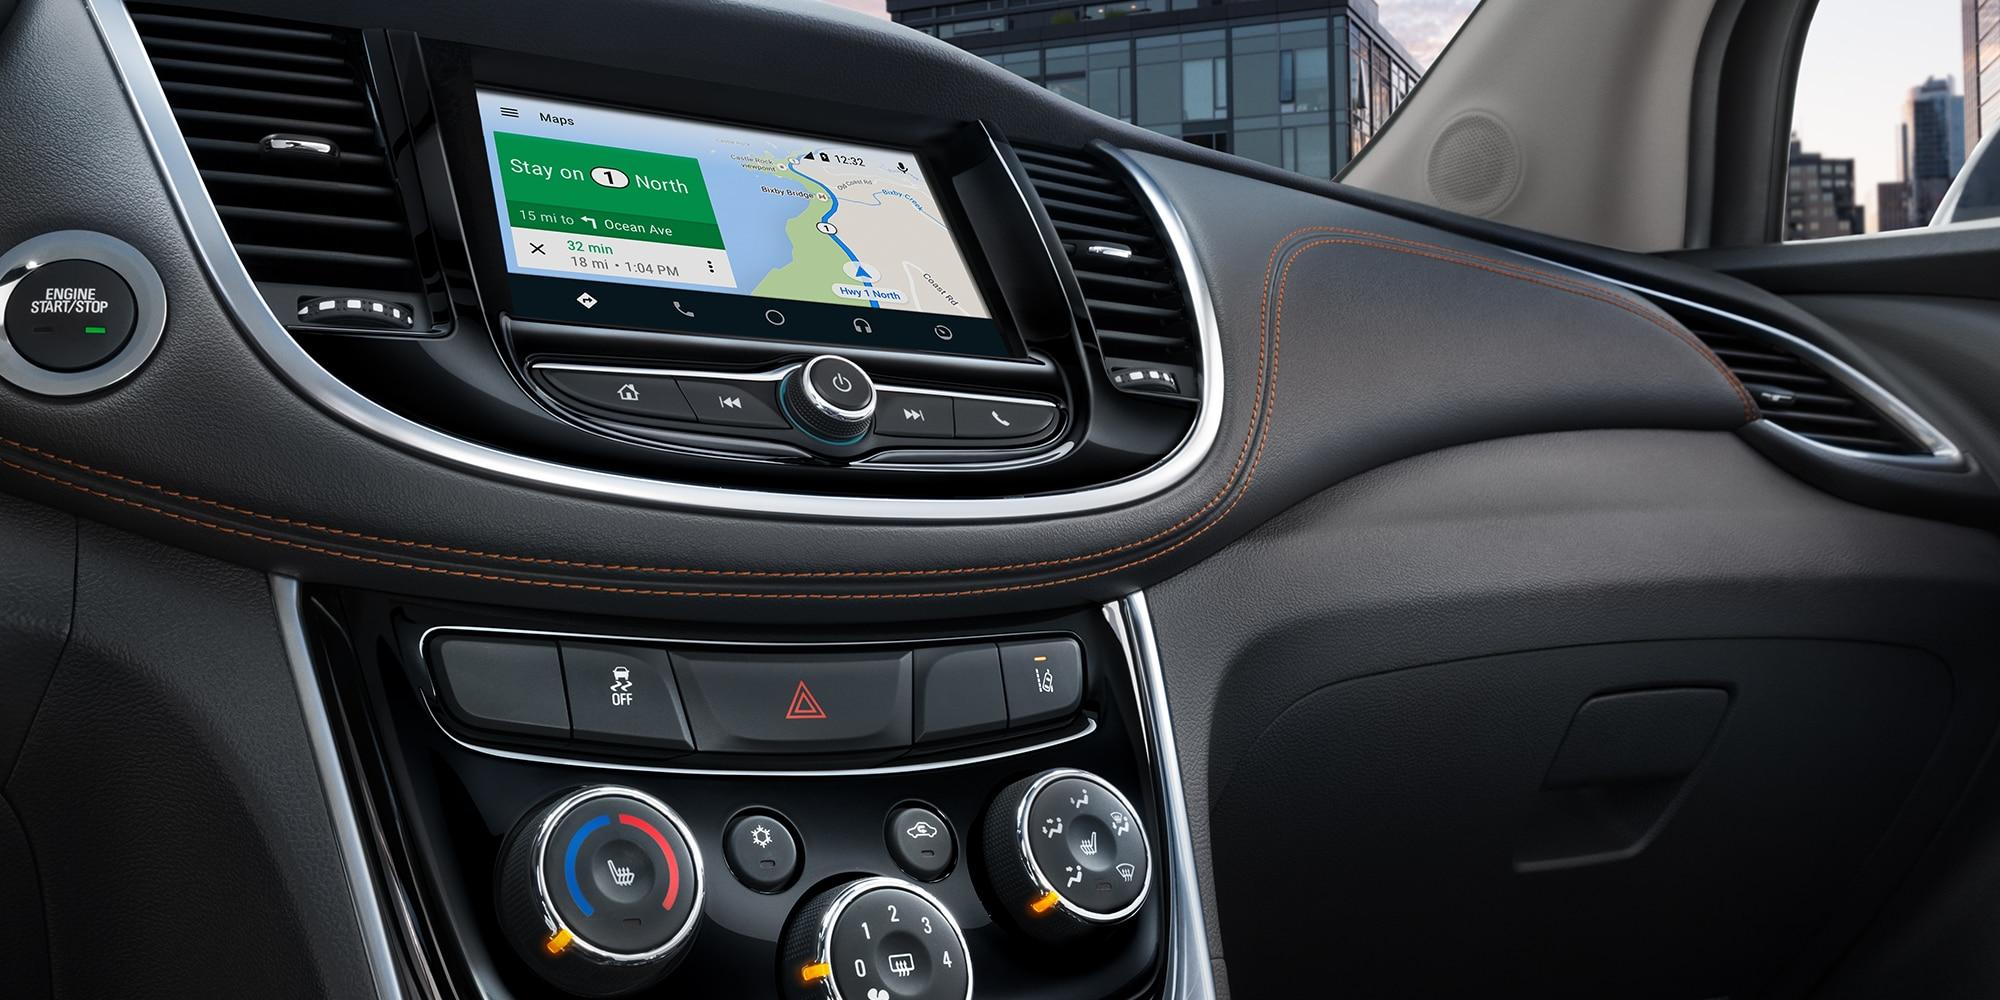 Tecnología de la SUV Trax 2019 compacta: pantalla táctil a color